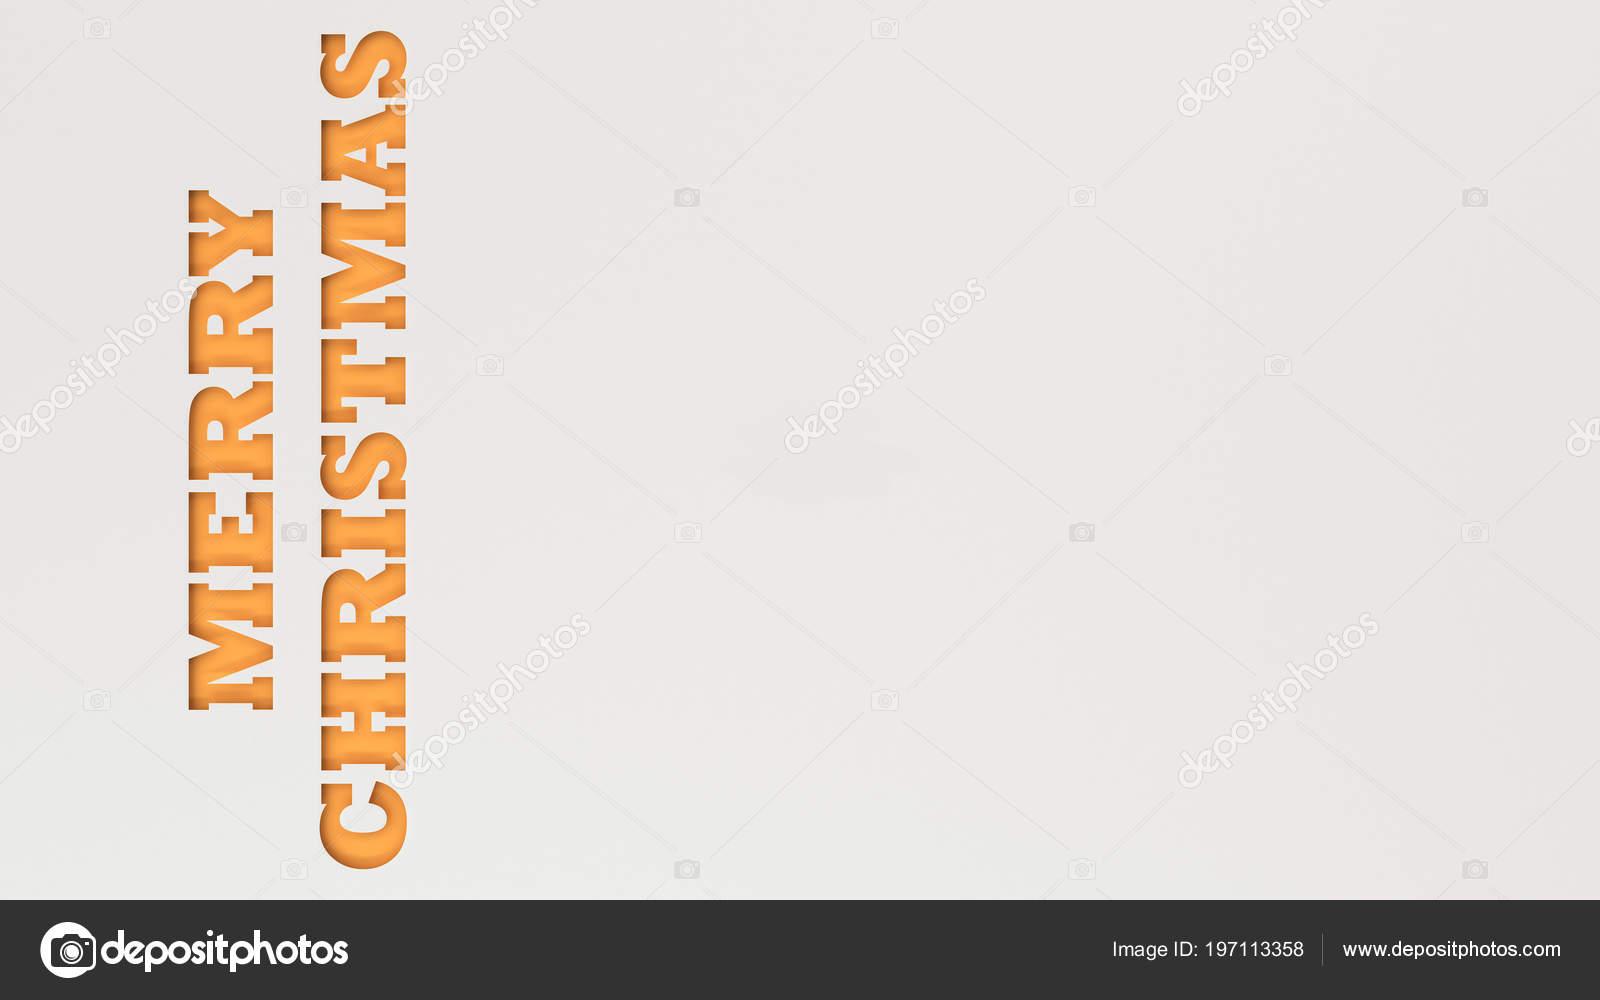 orange merry christmas words cut white paper rendering illustration stock photo - Merry Christmas Words